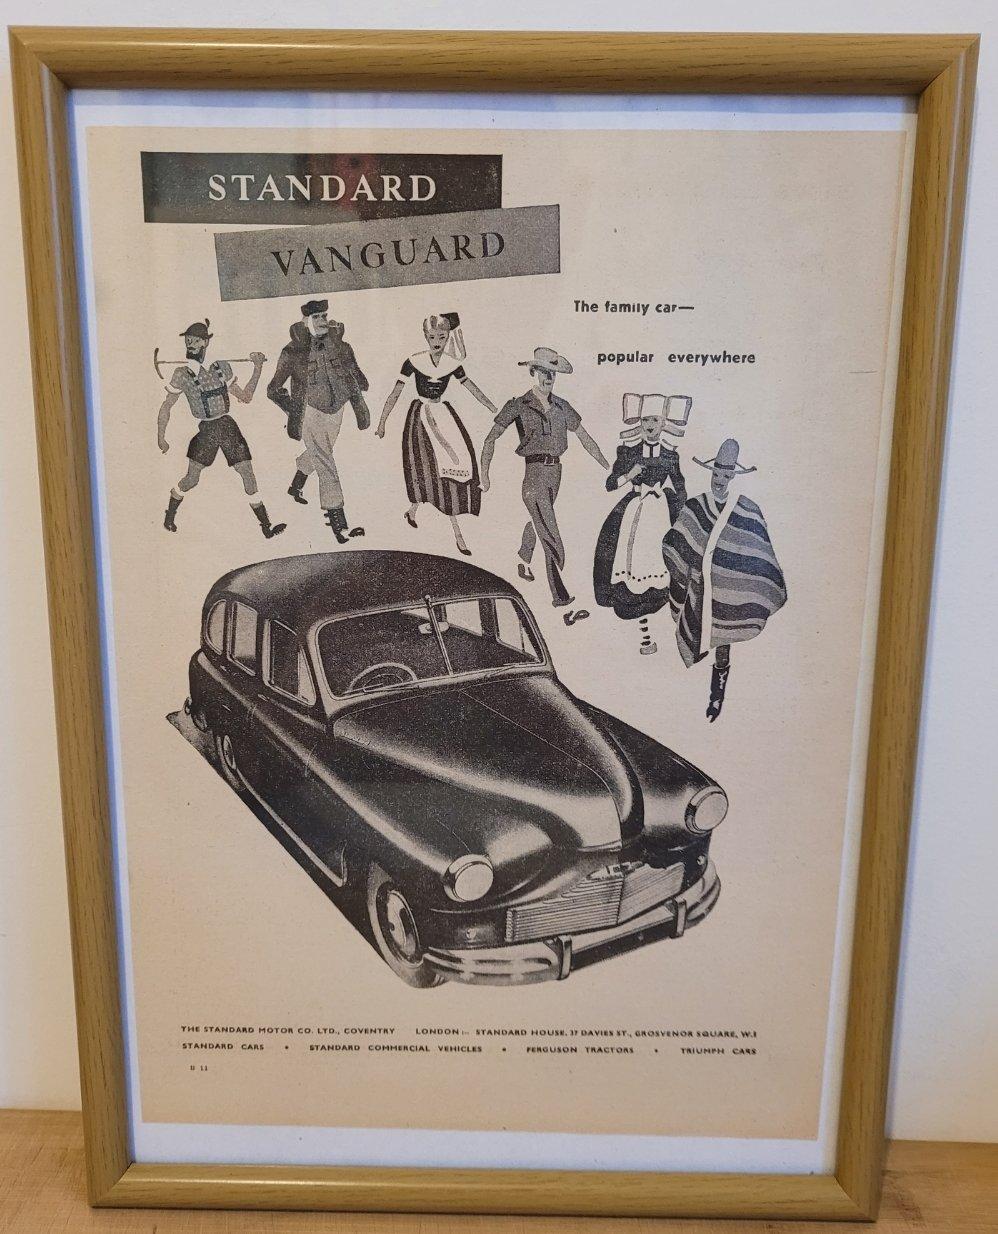 Original 1949 Standard Vanguard Framed Advert